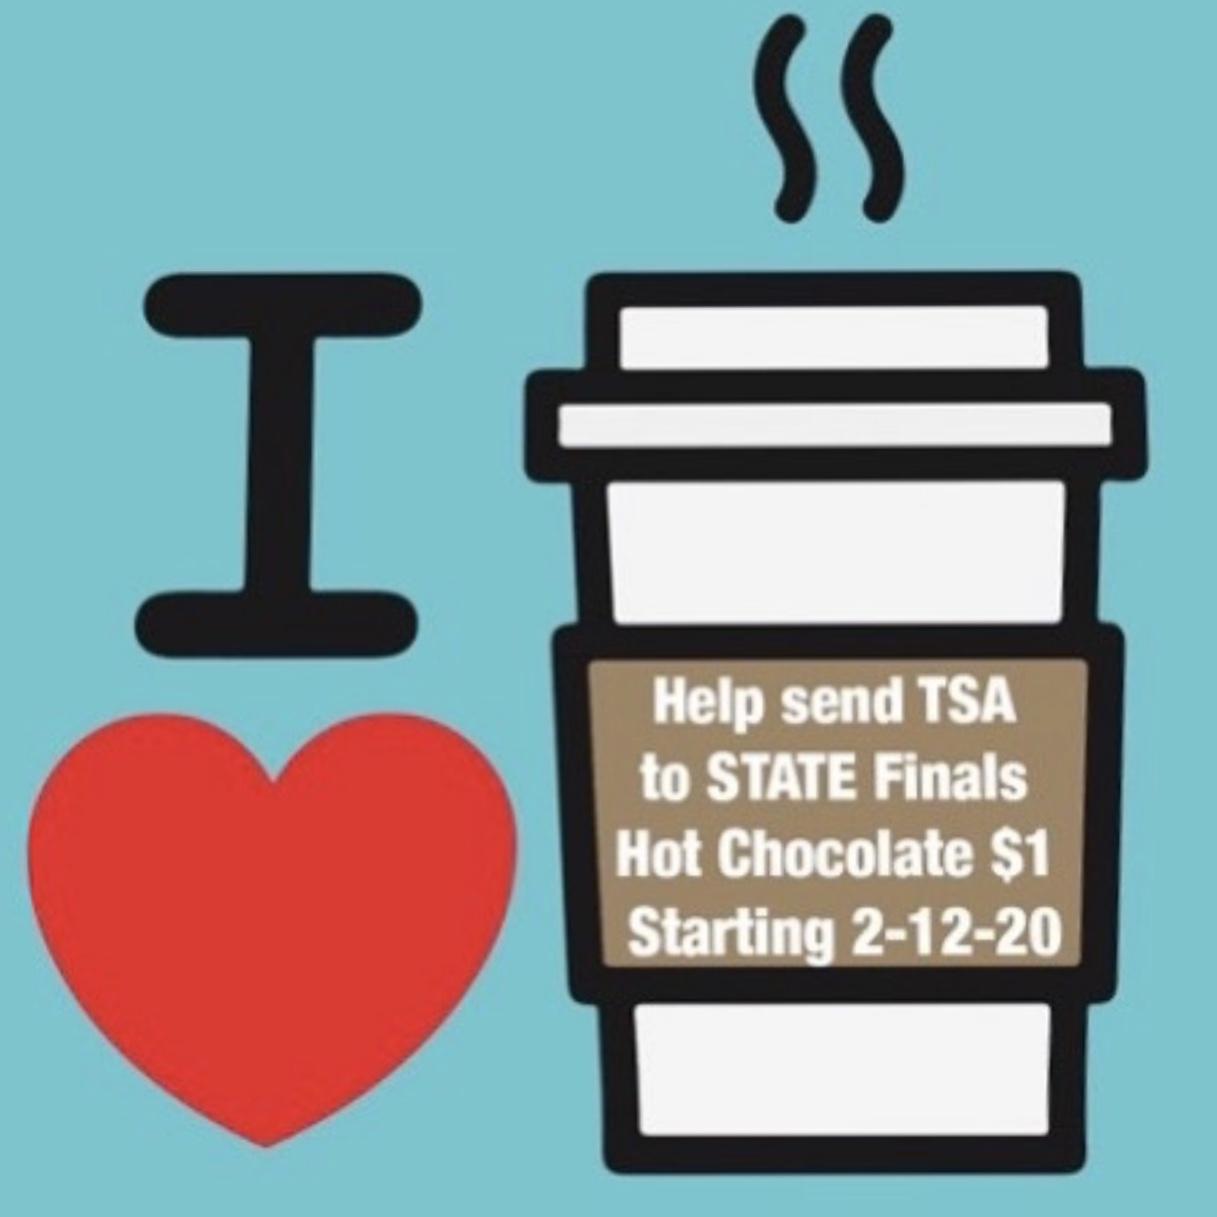 hot chocolate fundraiser flyer